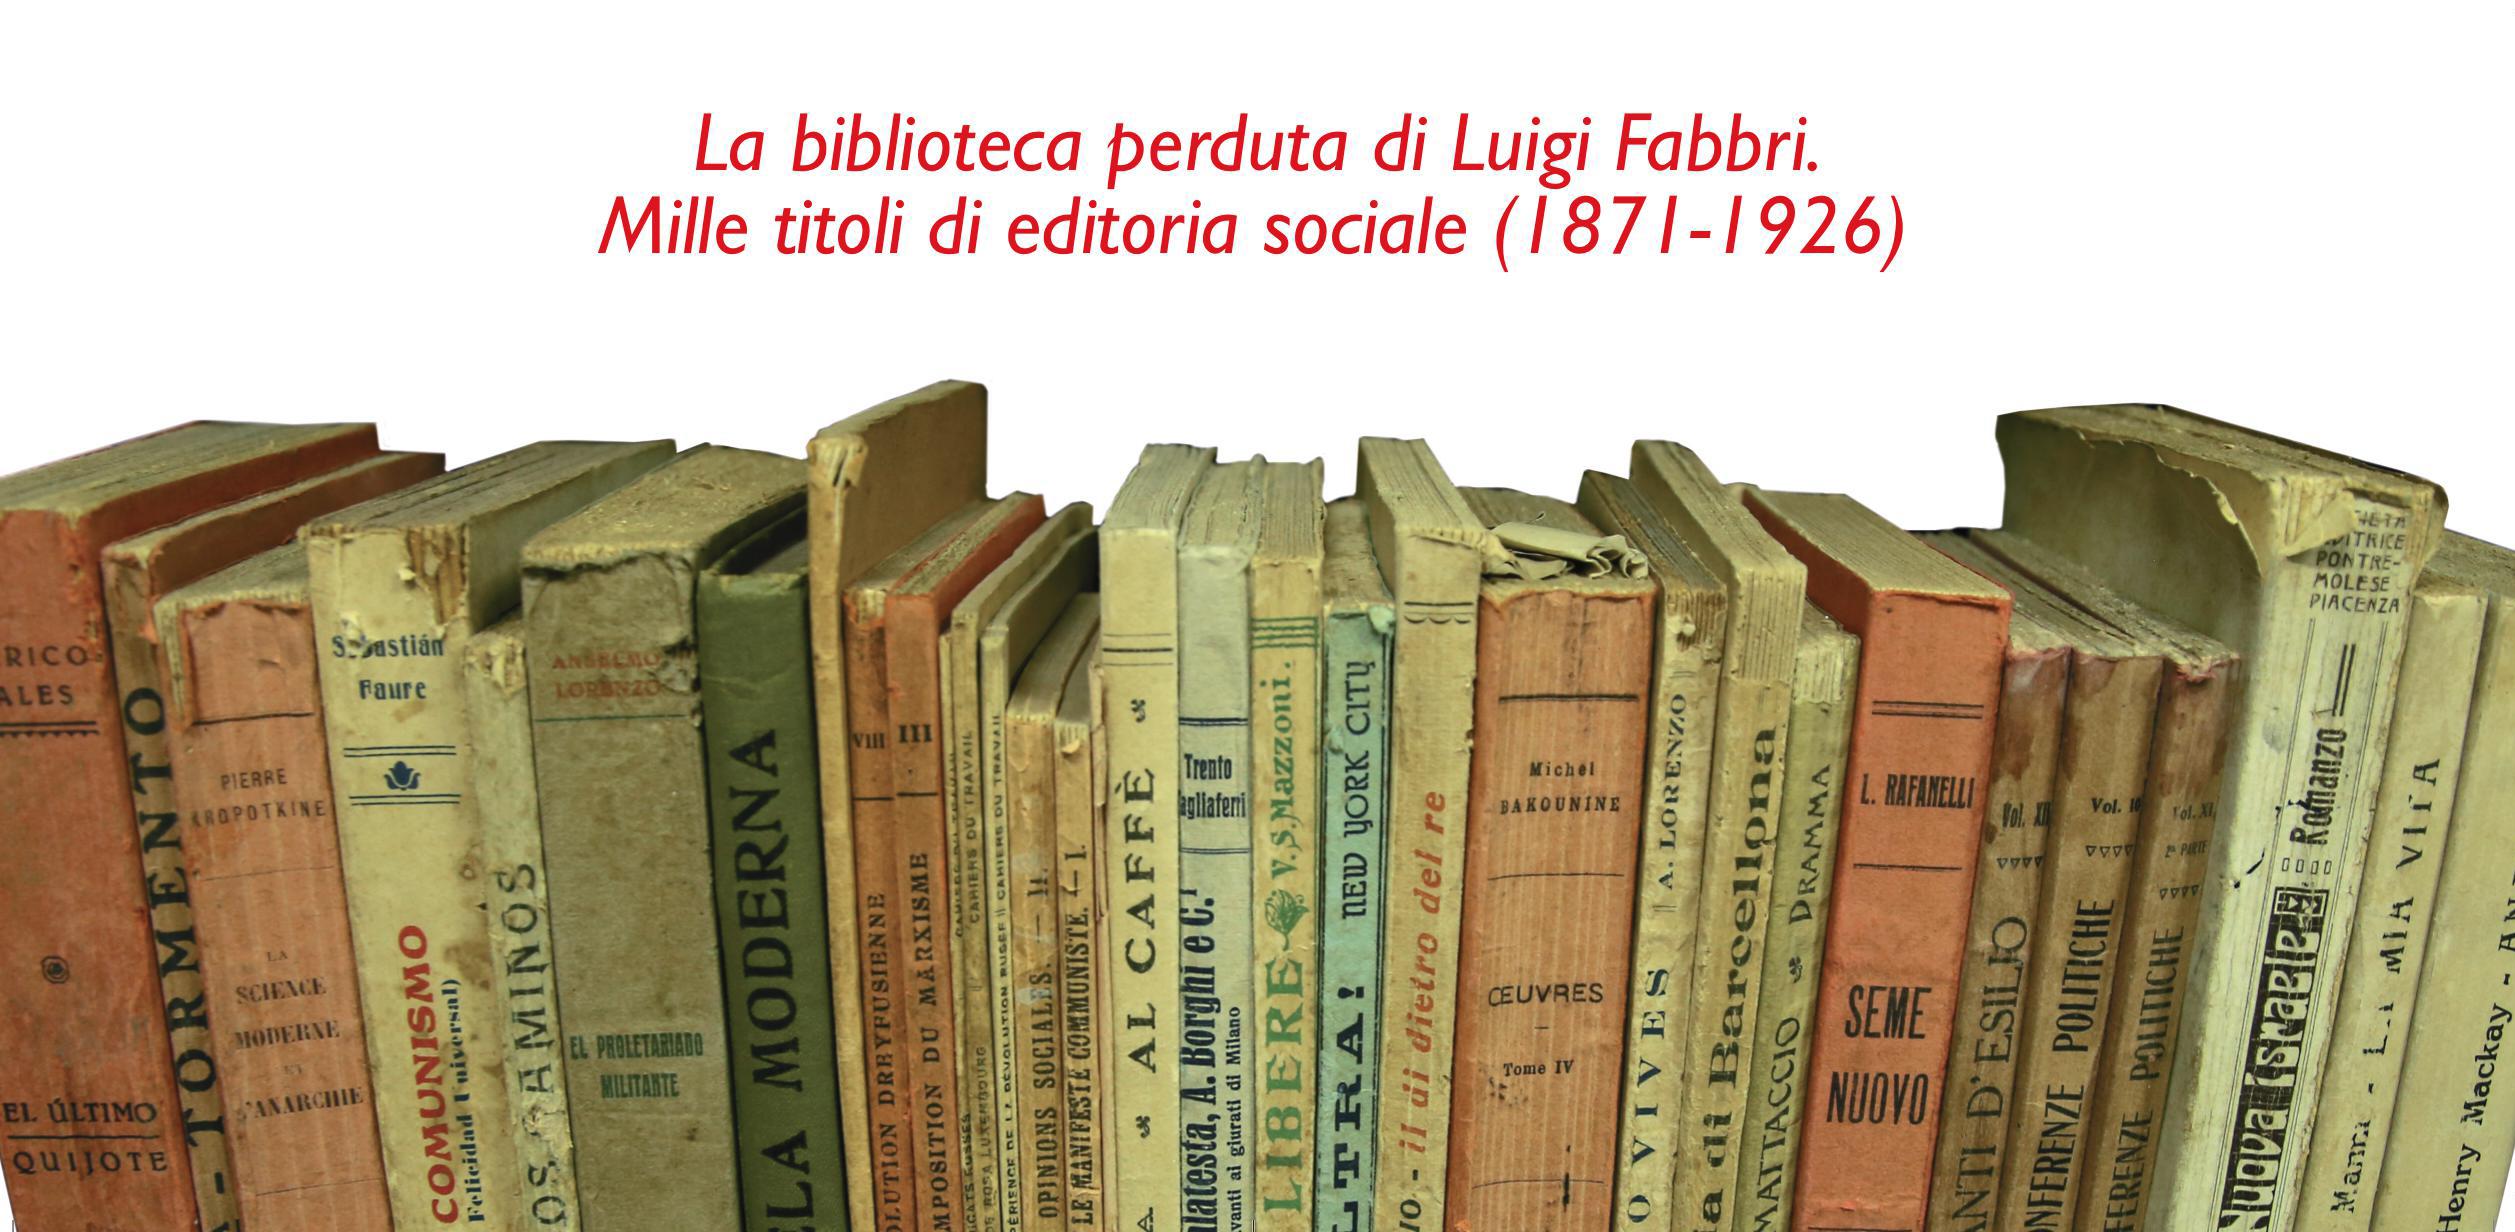 Luigi Fabbri1